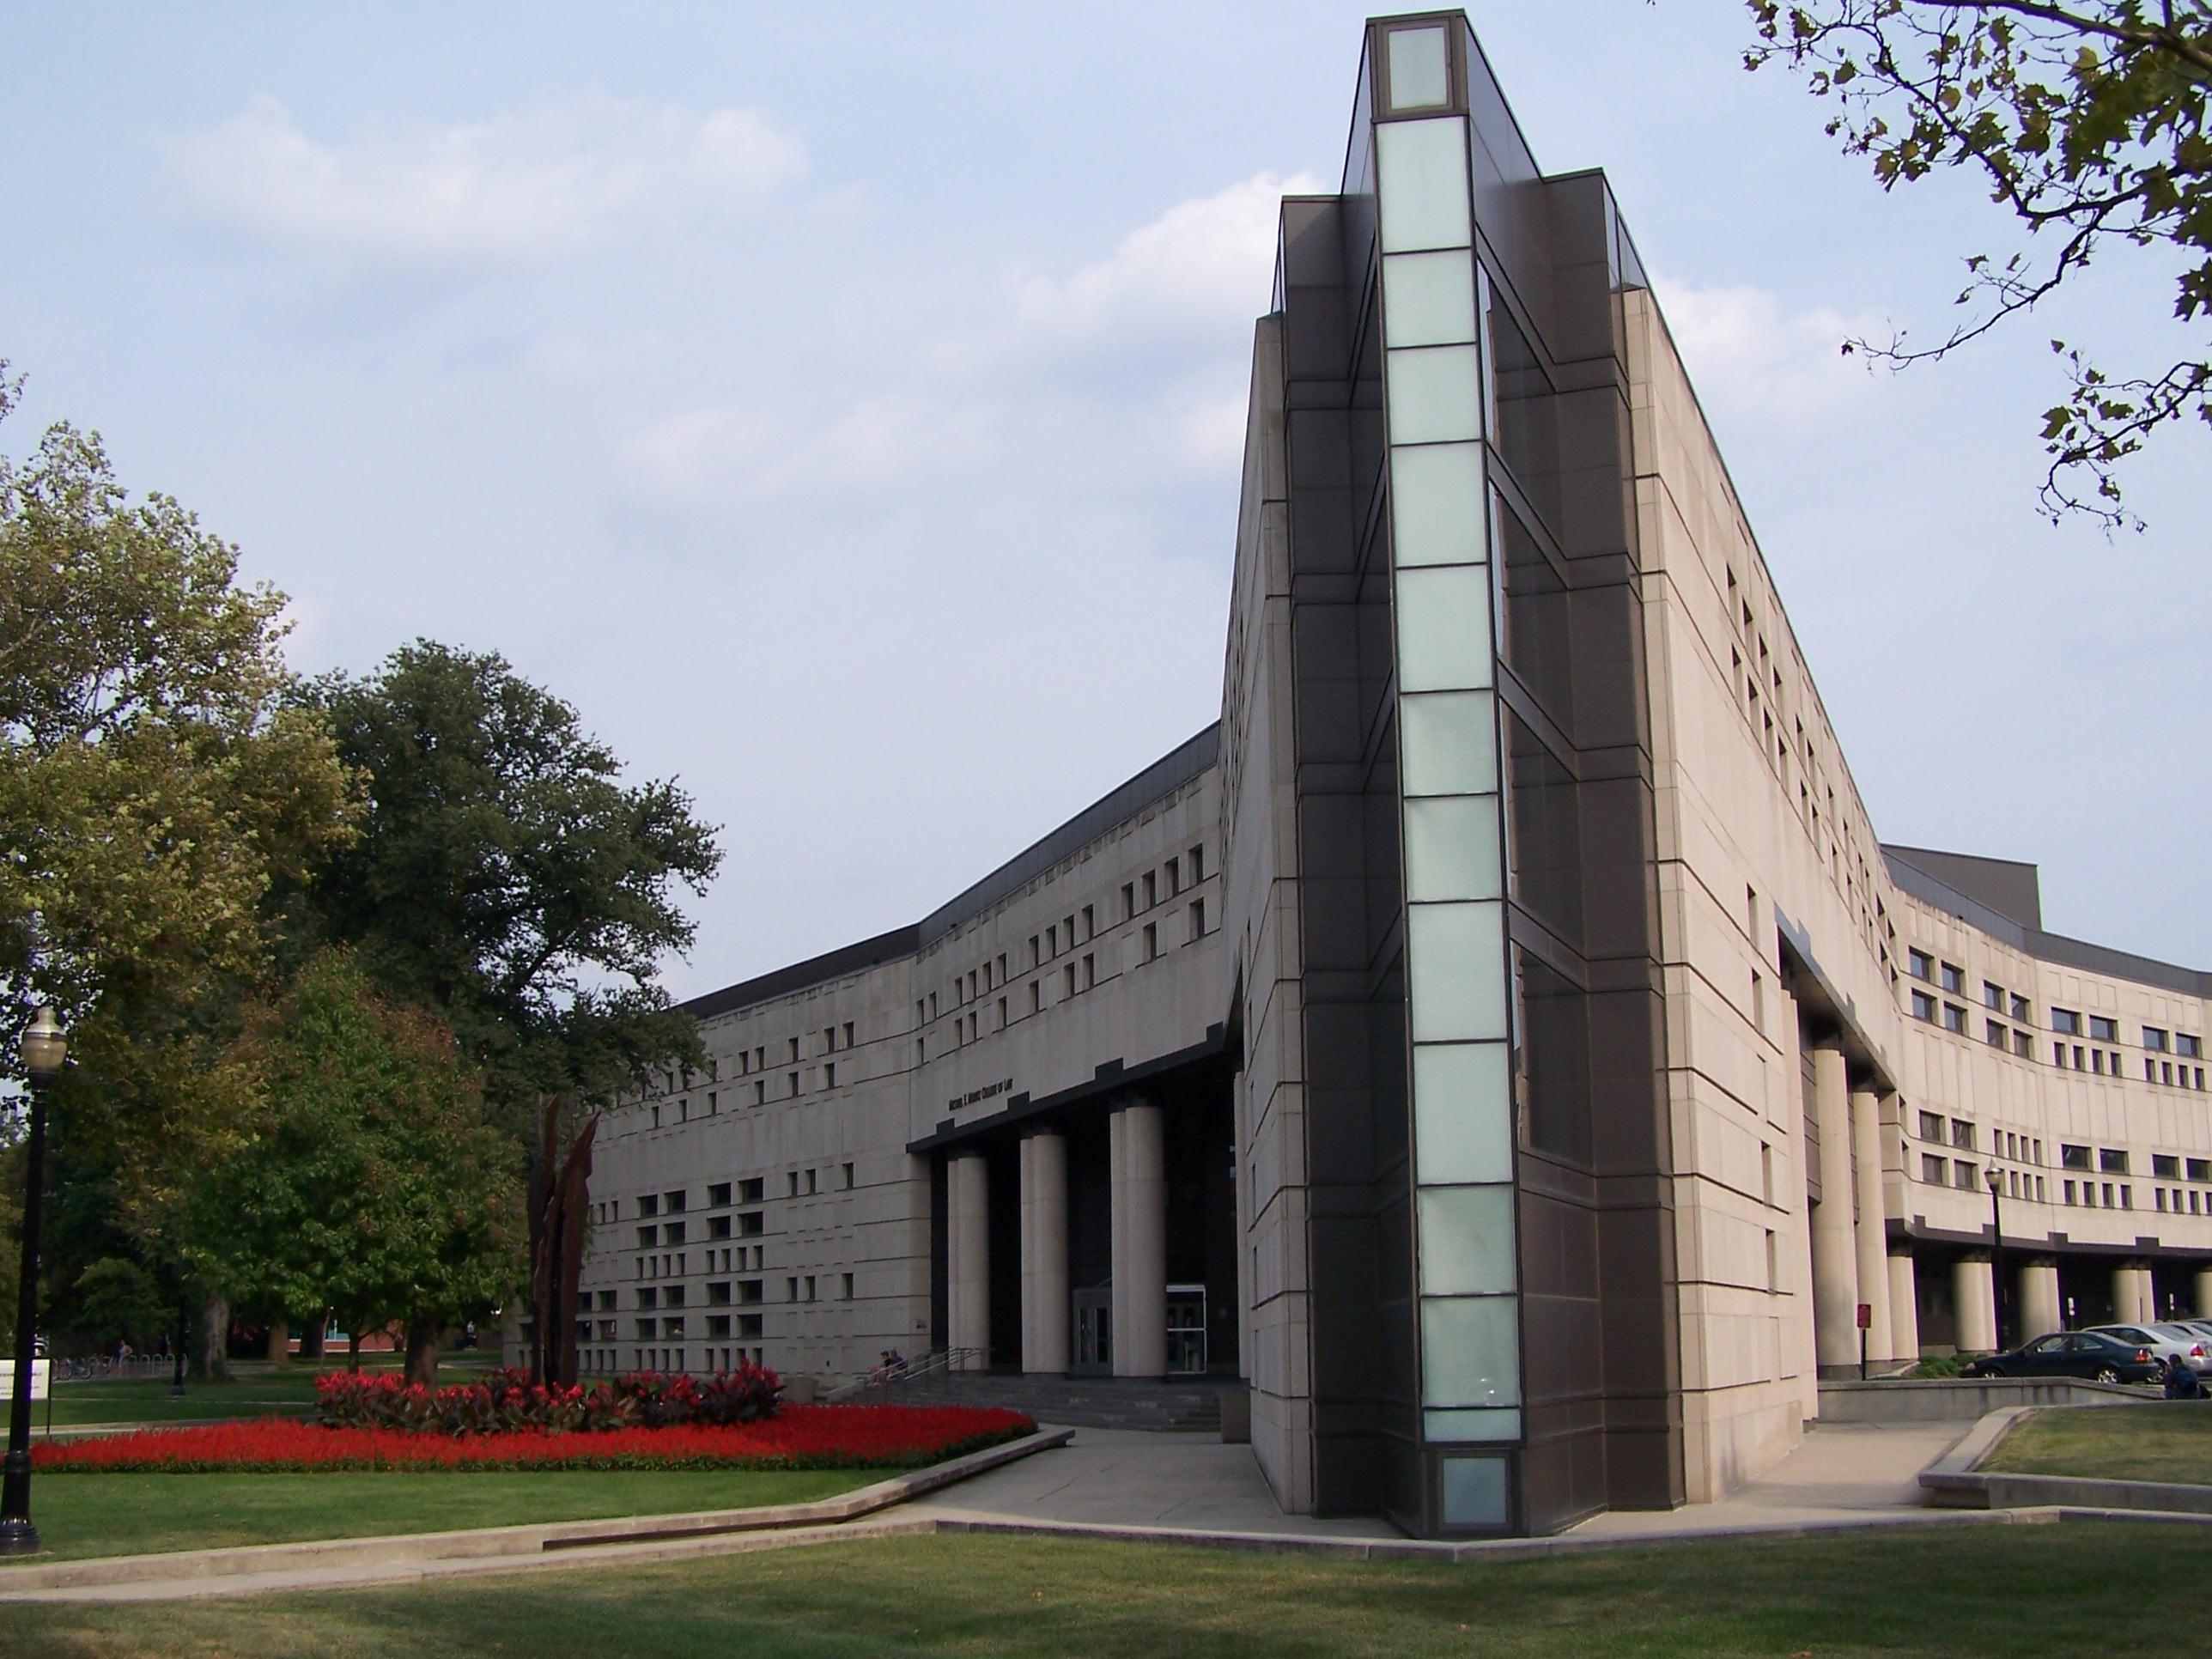 Drinko Hall